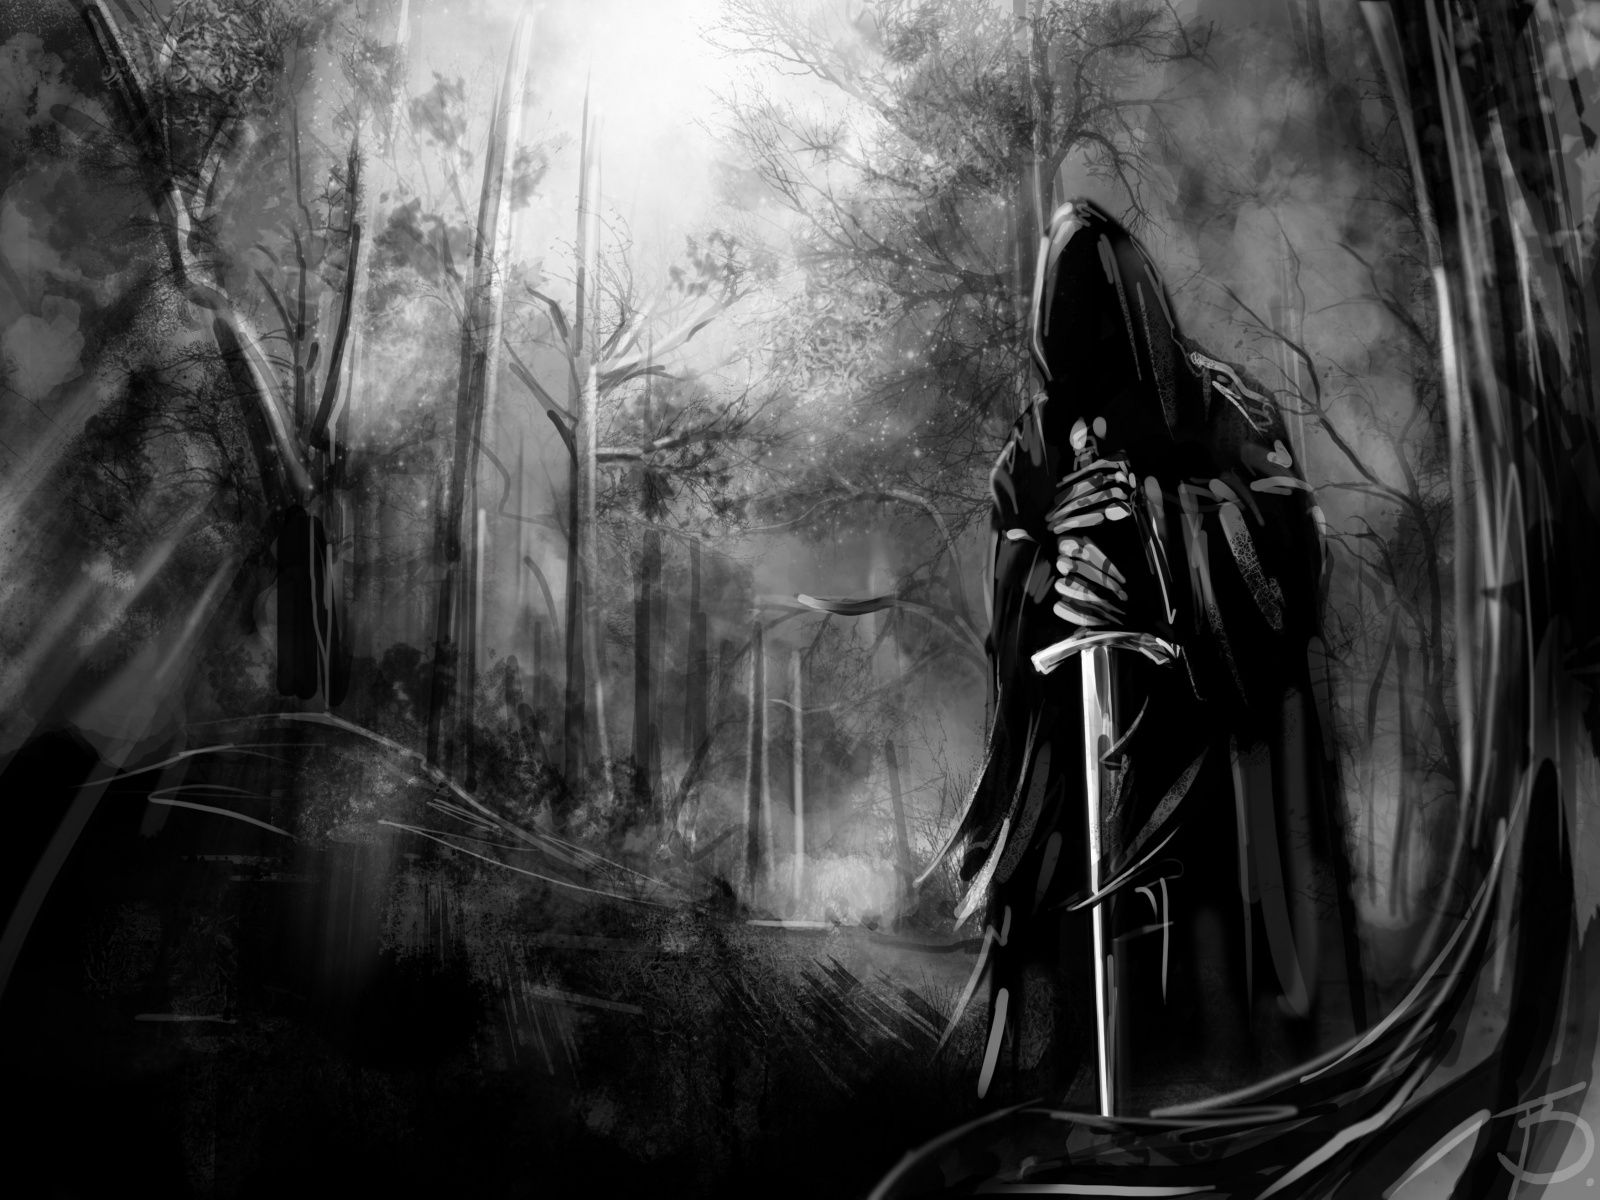 Hd Dark Wallpapers Abstract Dark Forest Wallpaper Hd